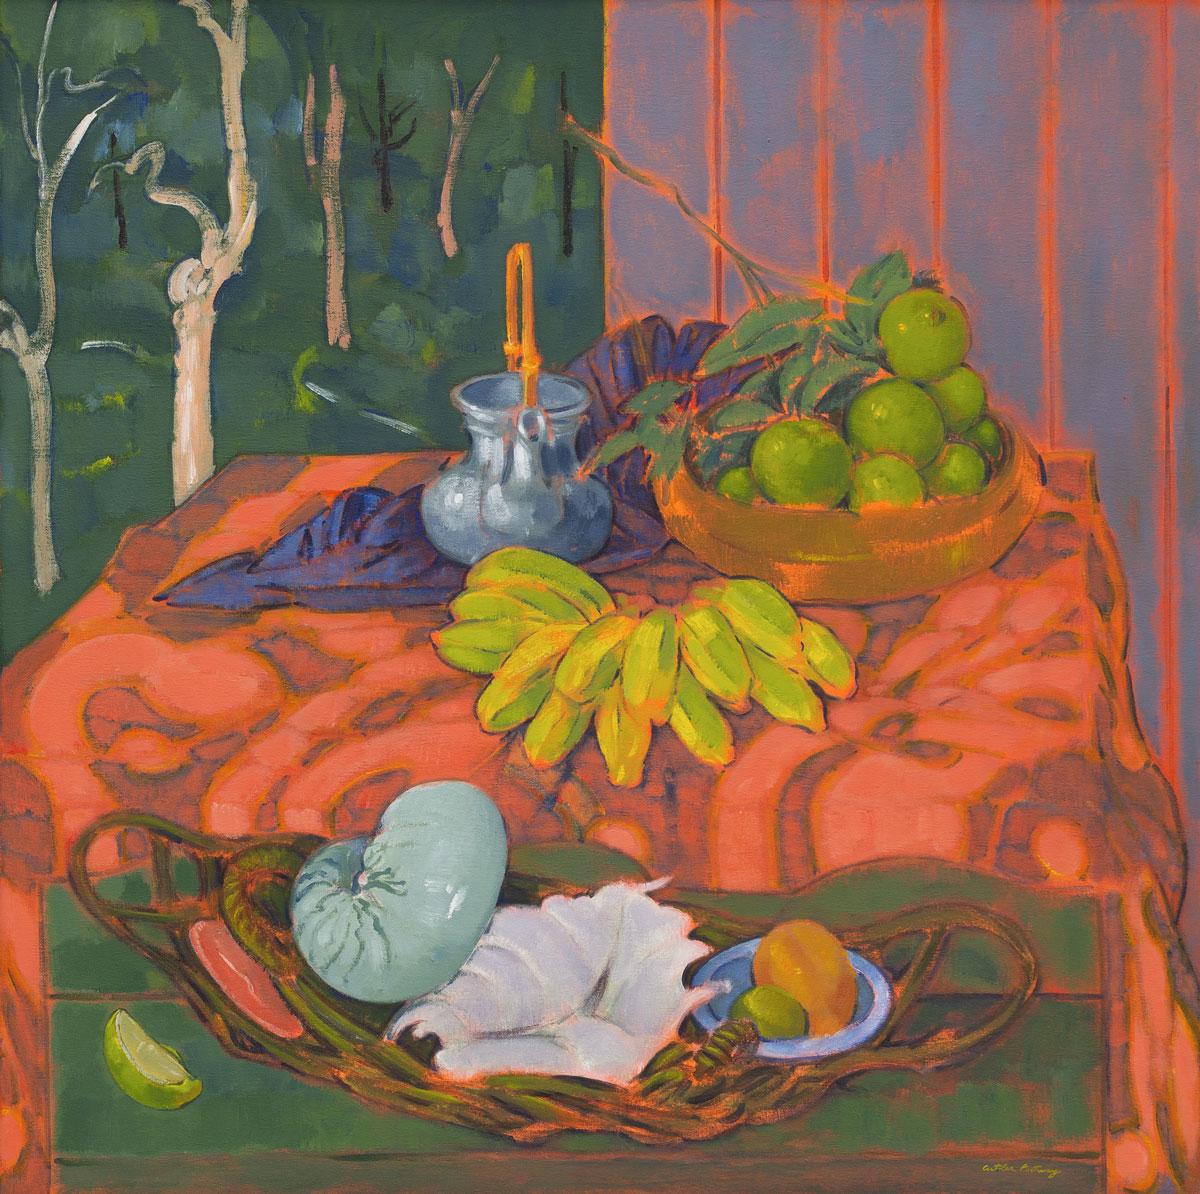 Cutler Footway, Still life with sugar bananas, shells and landscape 2011–14, acrylic on canvas, 90 × 90cm